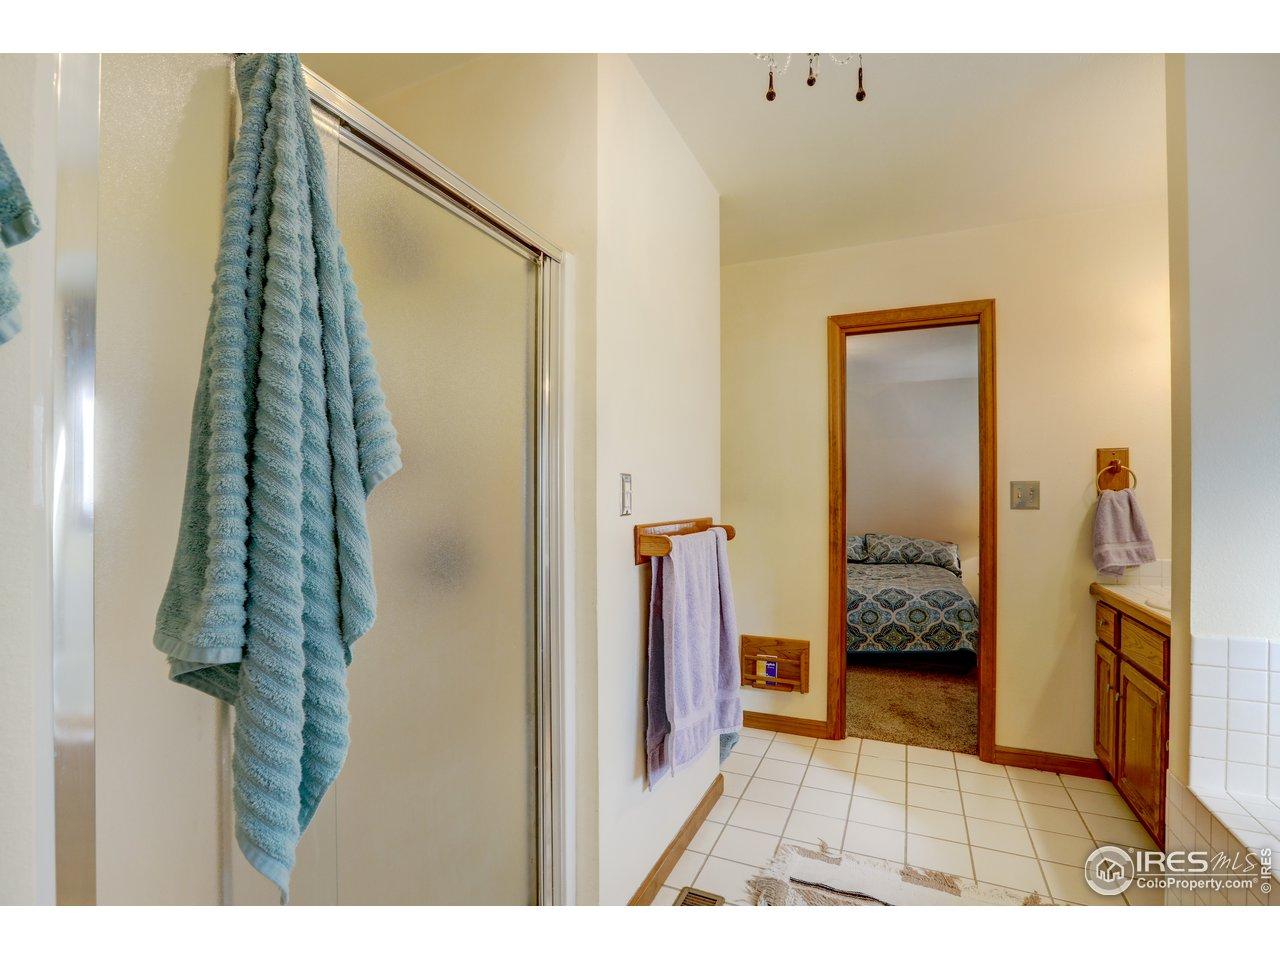 Primary private bath. separate shower.